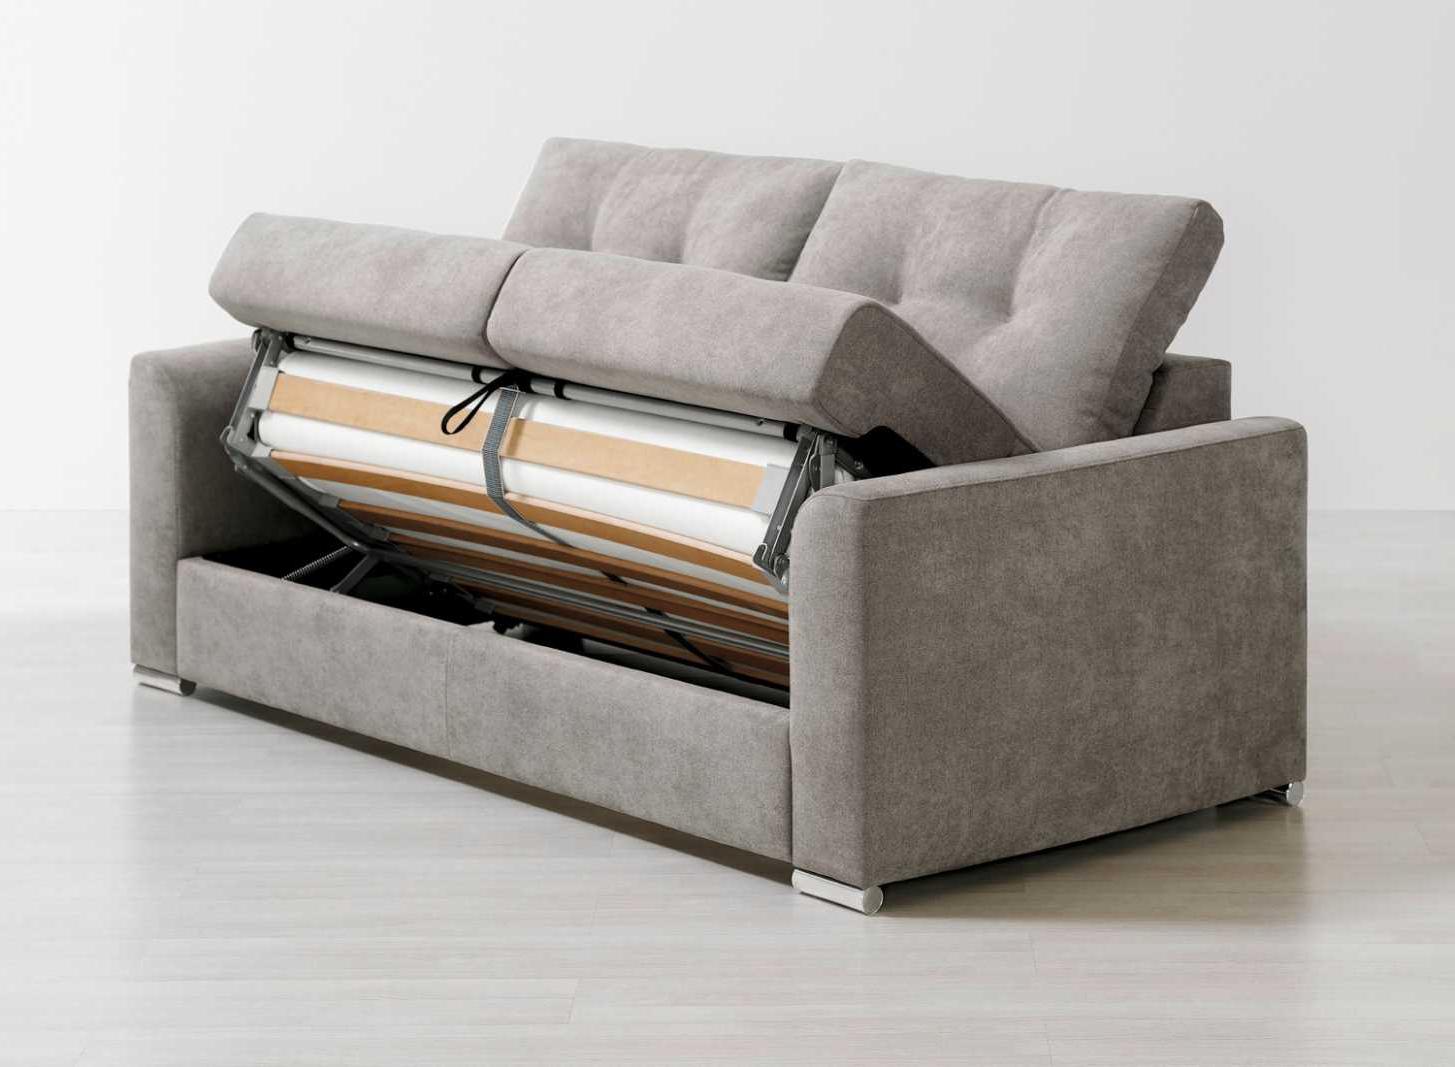 Sillon Cama Barato Ffdn Sillon Cama Individual Inspirational sofa Cama Barato Conforama